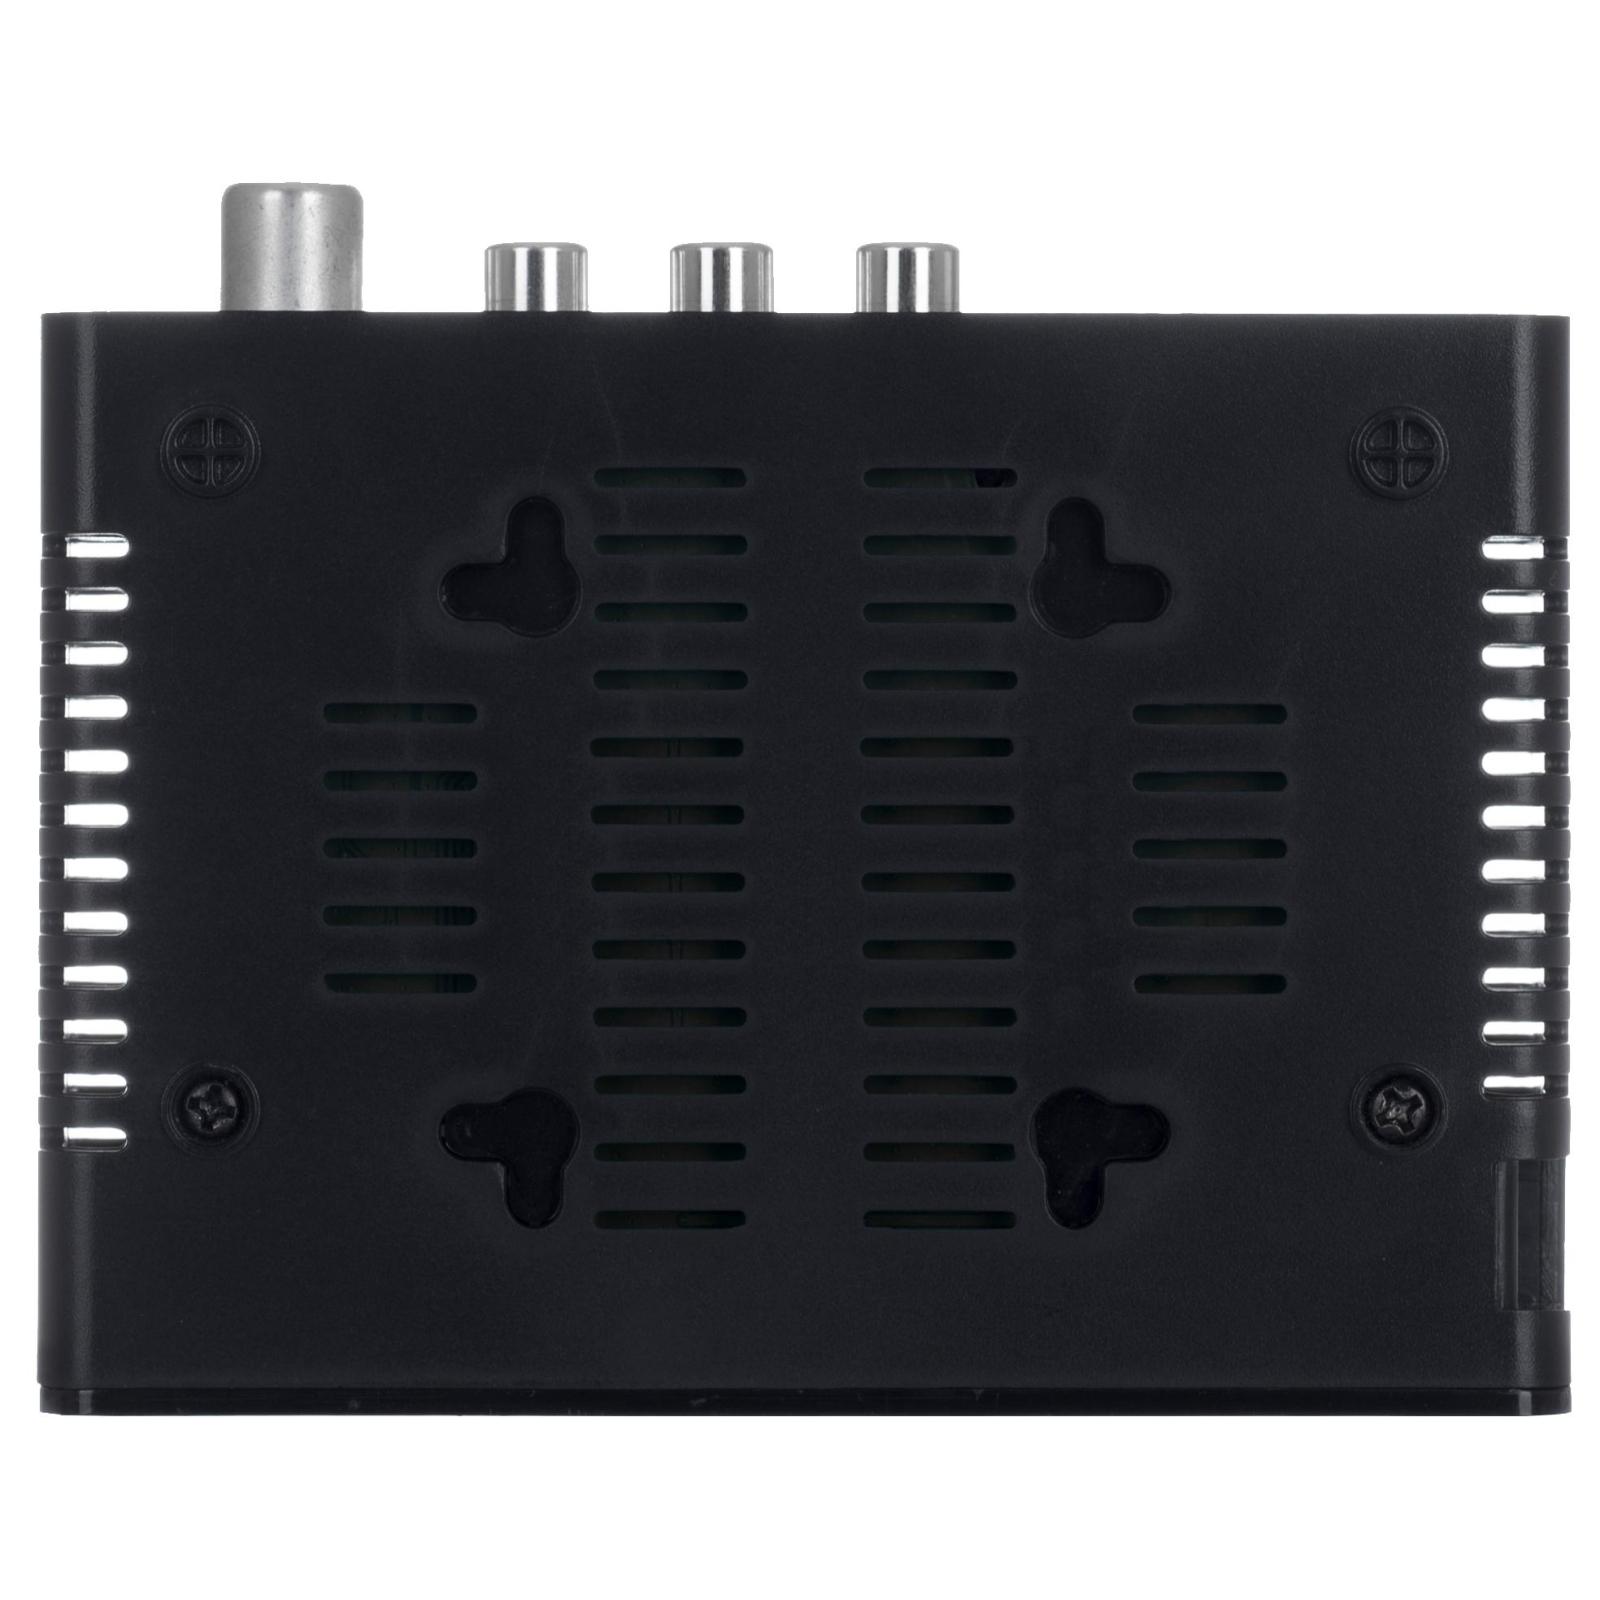 ТВ тюнер Ergo 1108 (DVB-T, DVB-T2) (STB-1108) зображення 3